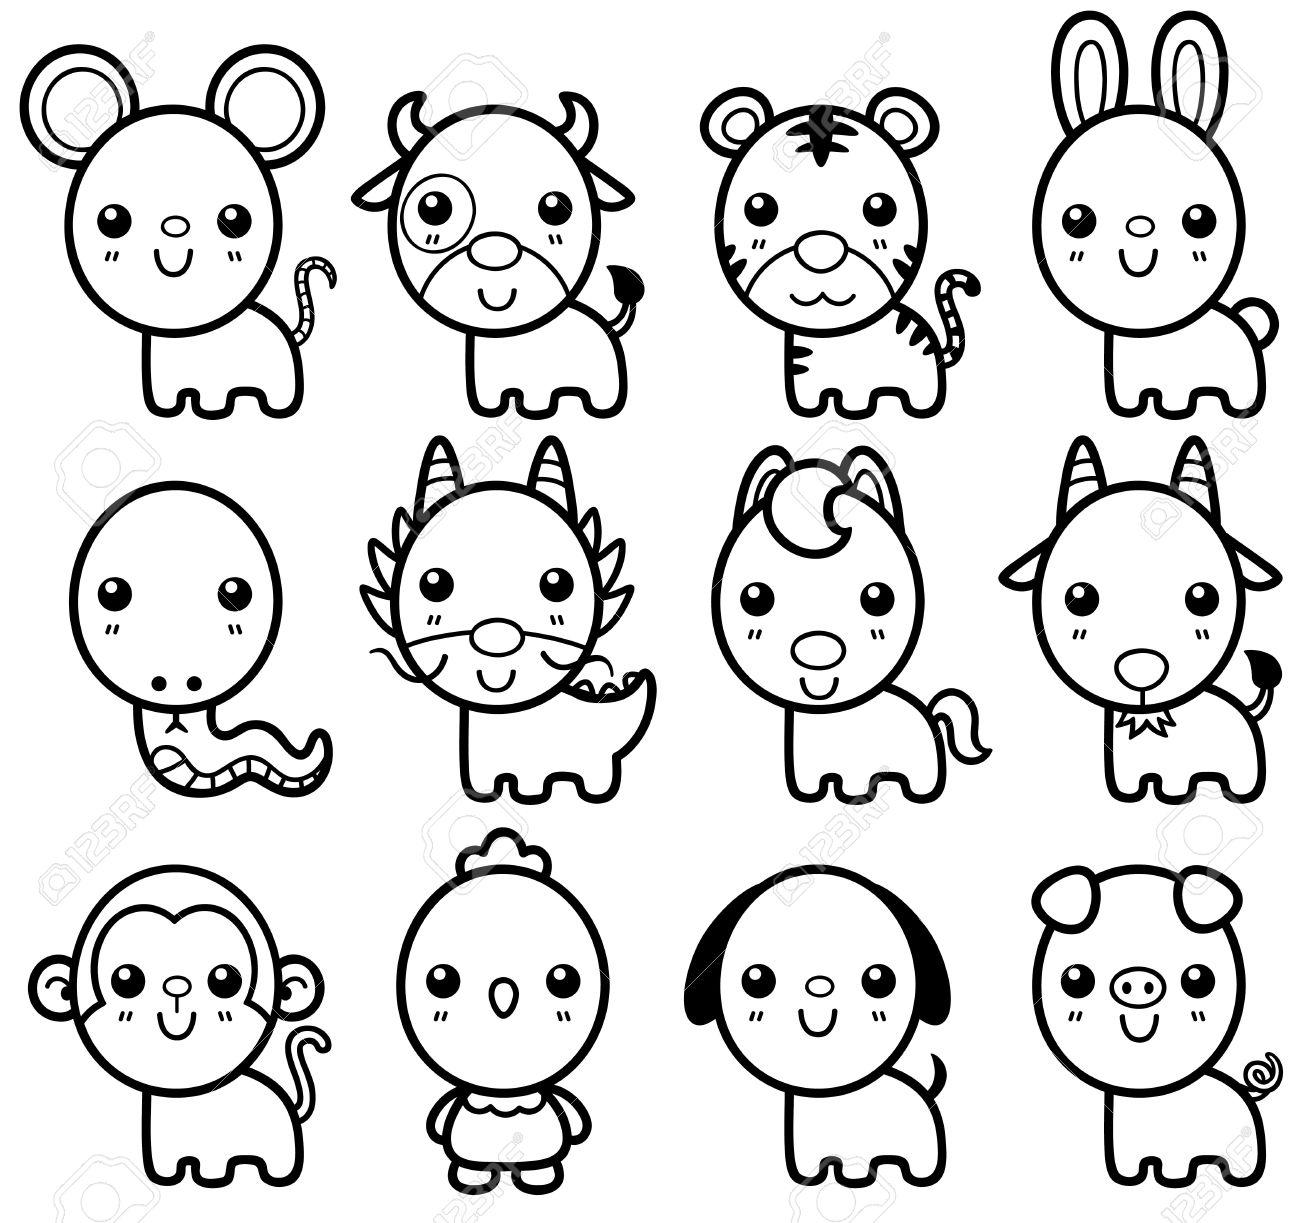 Animales Dibujos Para Colorear. Best Dibujo Para Colorear Camello ...